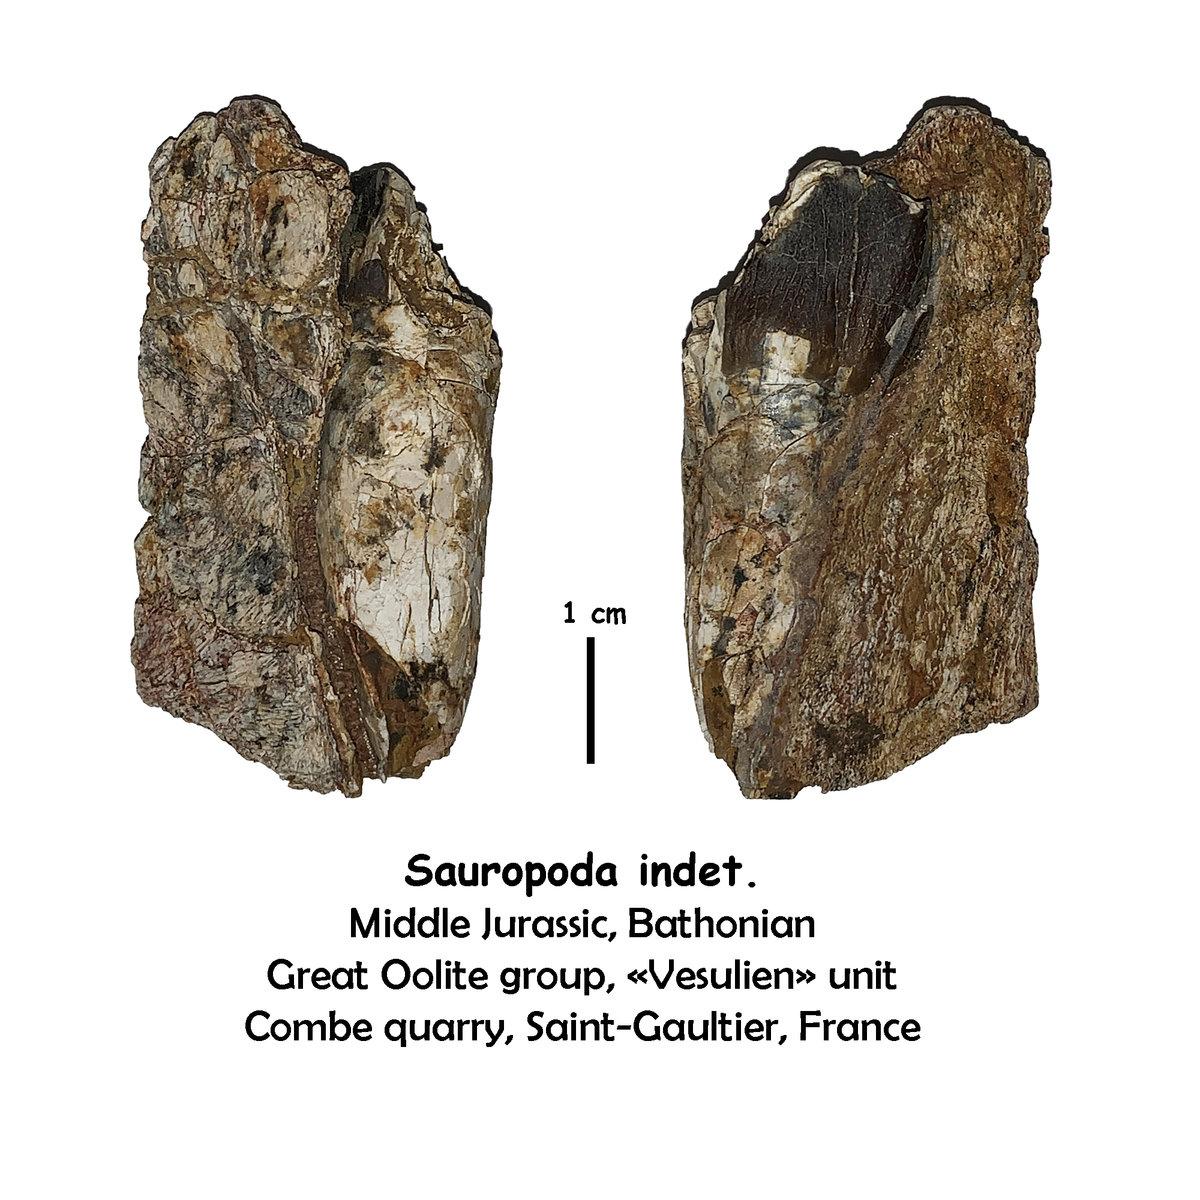 Jurassic sauropod from France